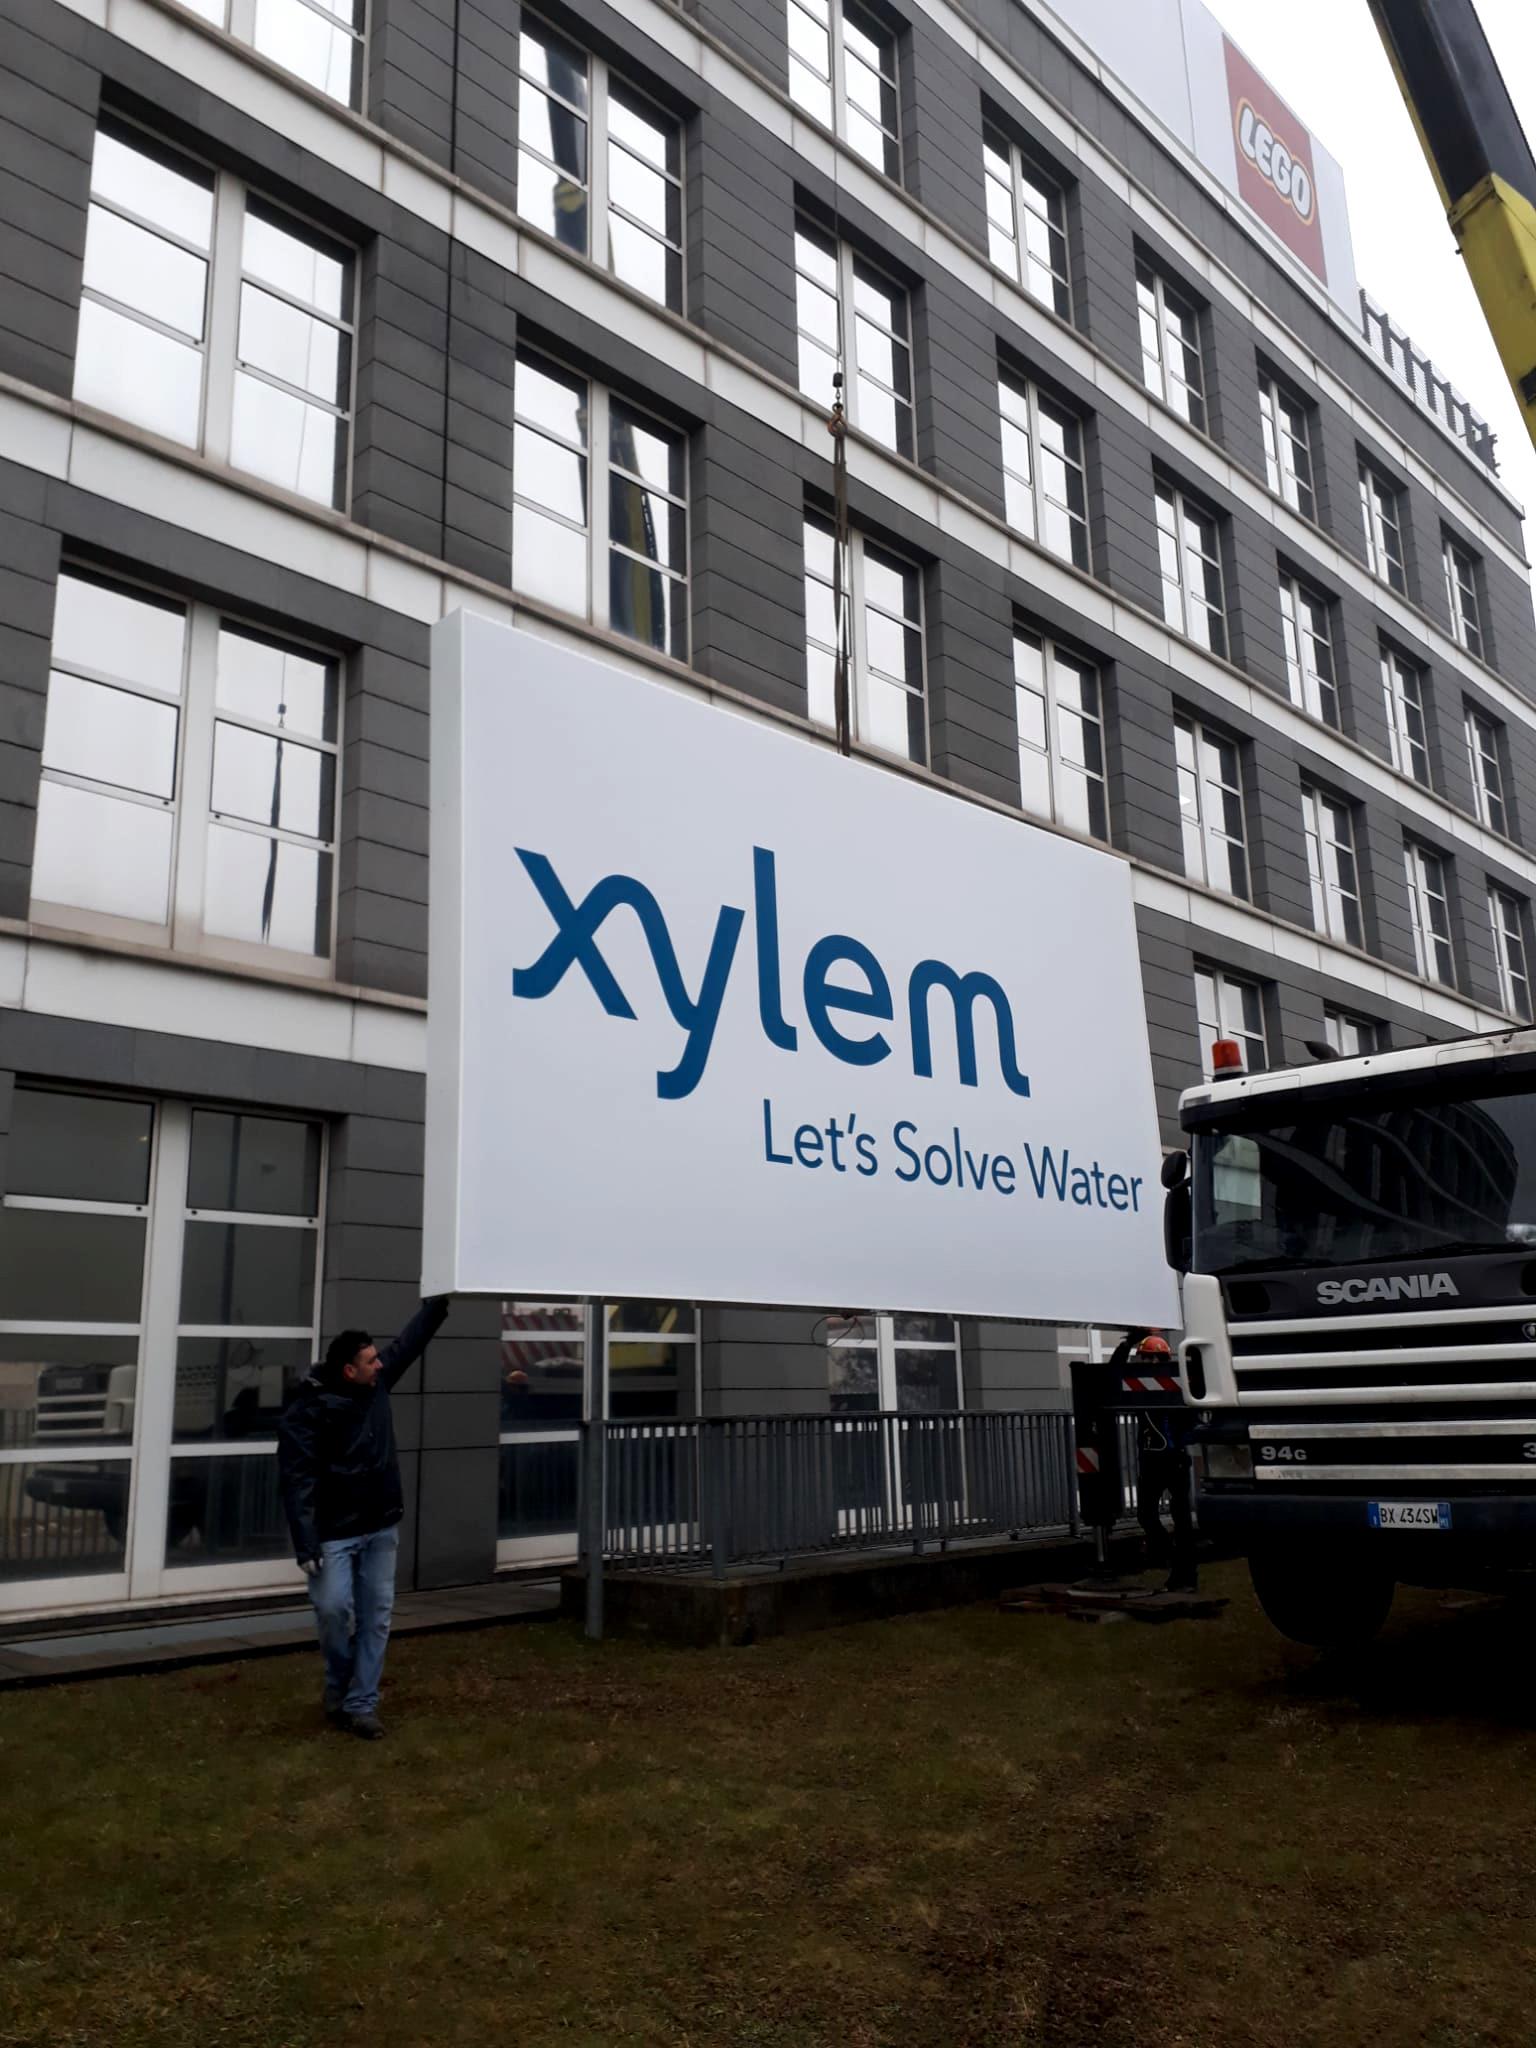 Insegna - Xylem4